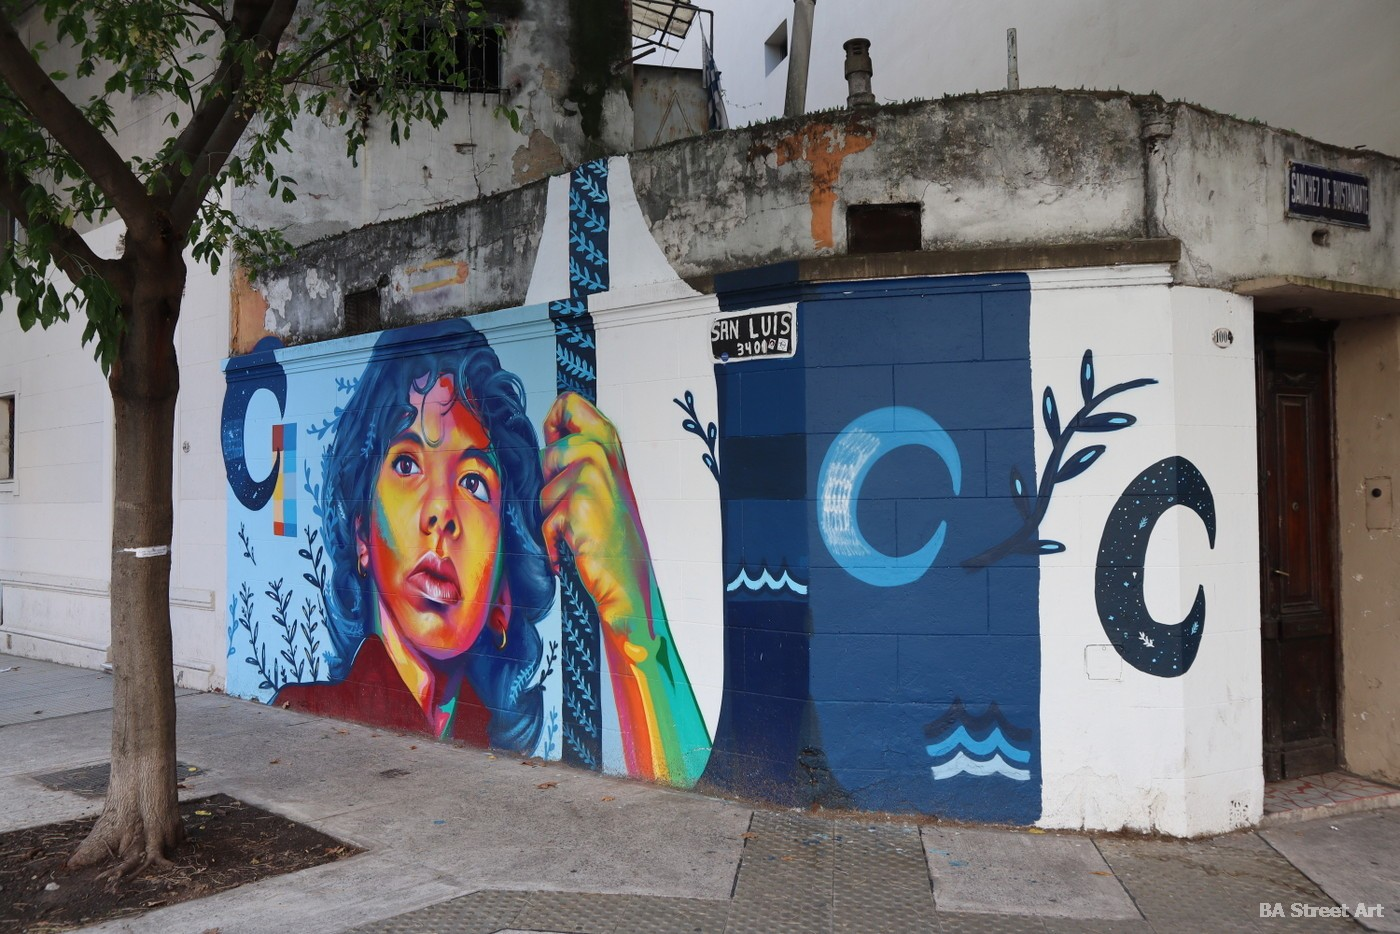 murales buenos aires arte callejero argentina thomas evans detour moon luna lucia portrait buenosairesstreetart.com